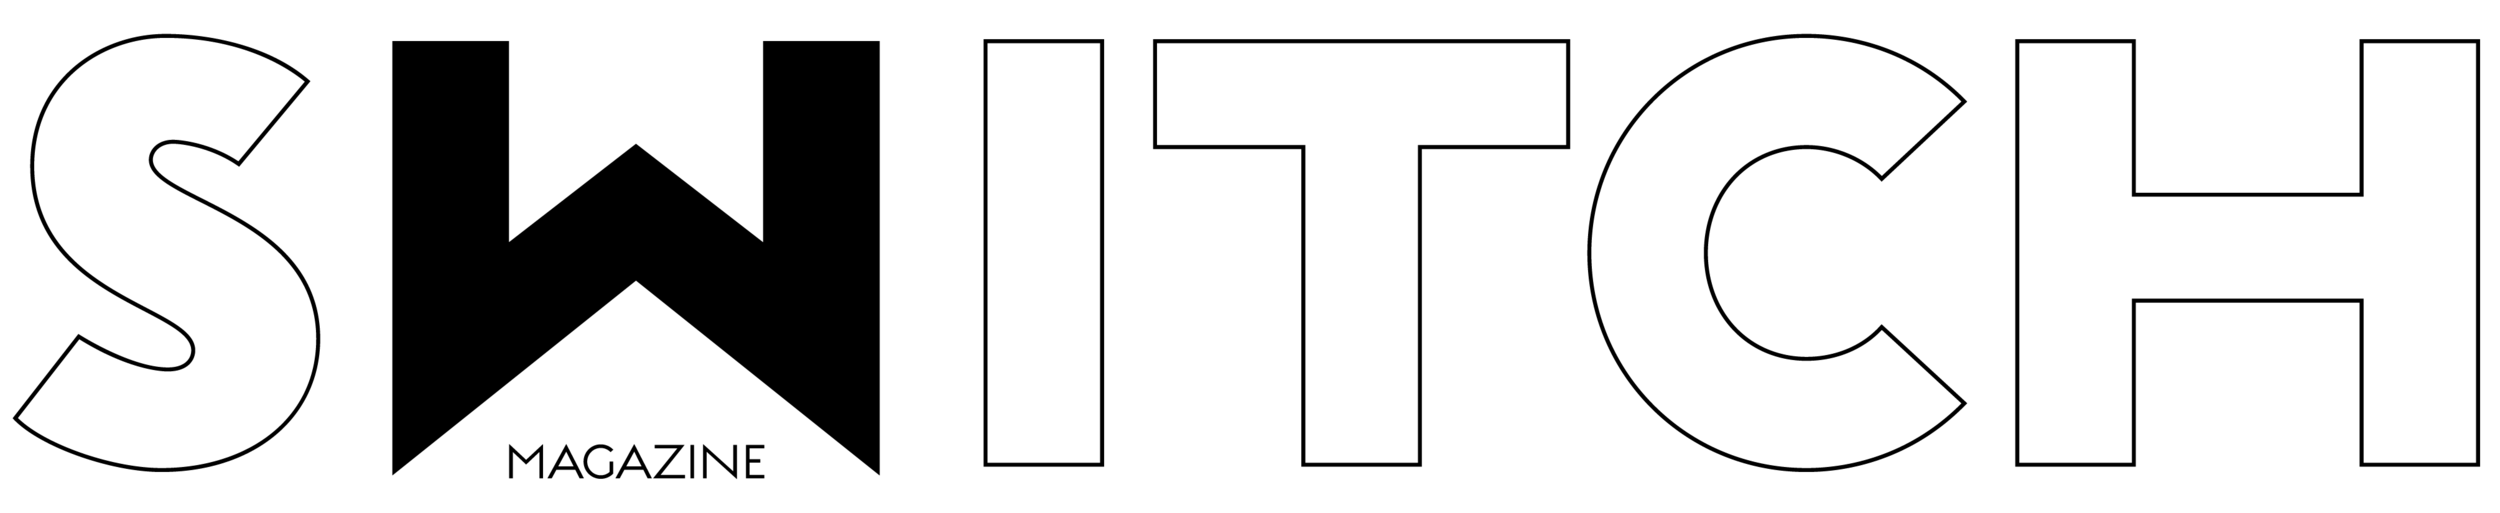 cropped-Switch-logo-esteso-nero-1.png